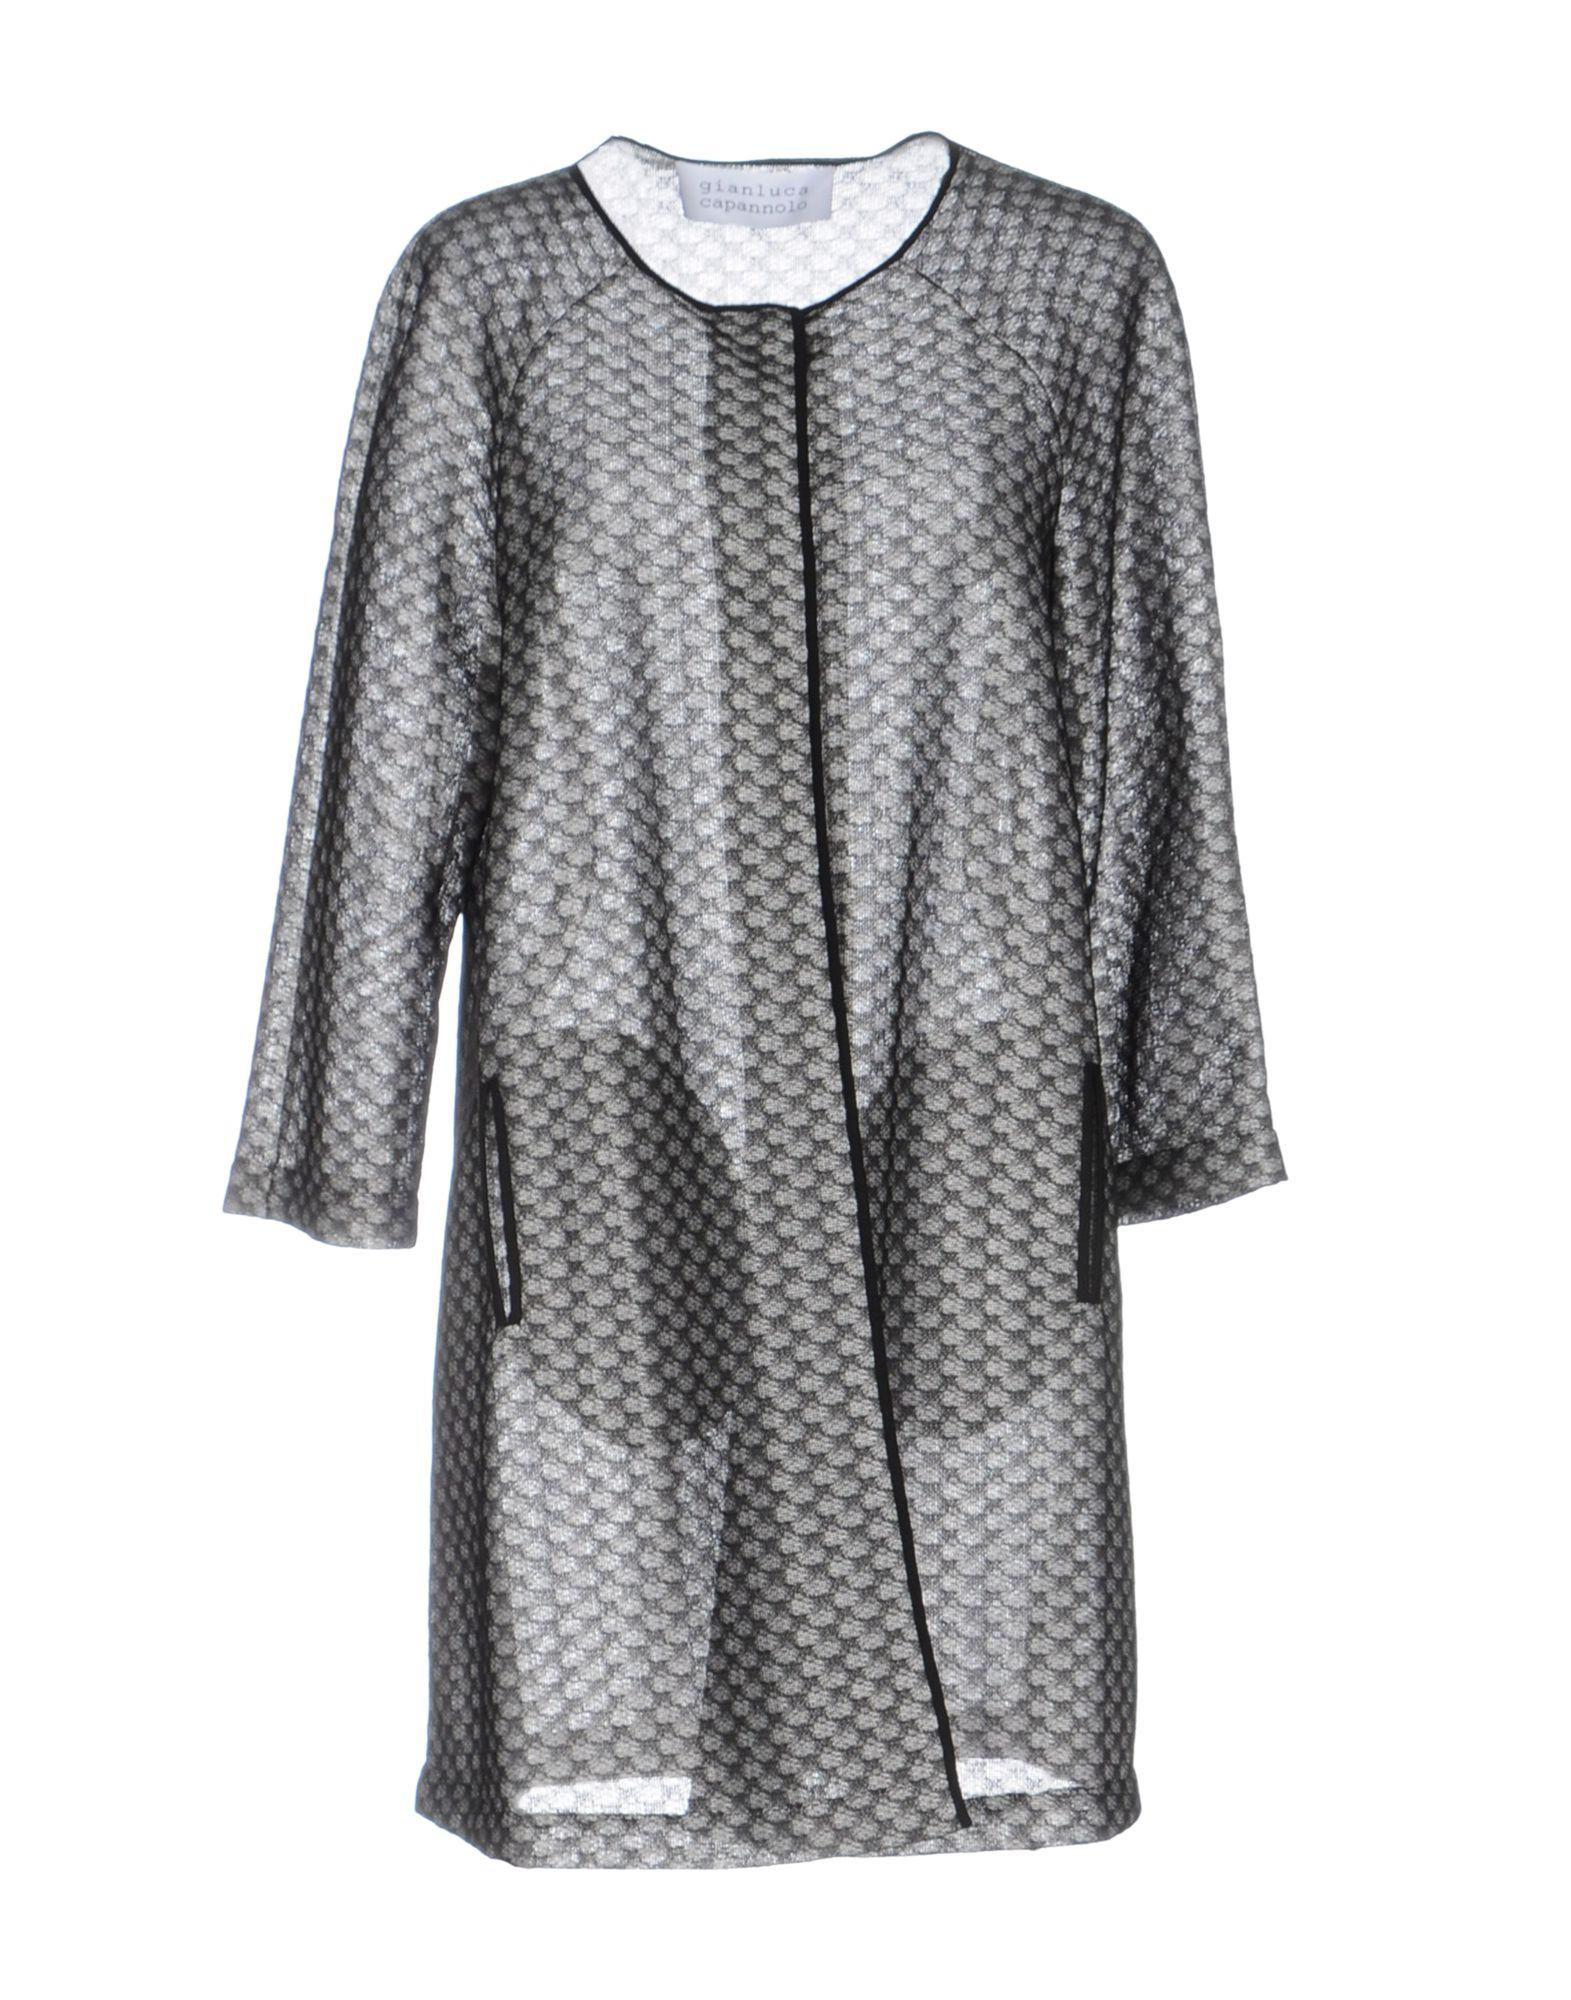 GIANLUCA CAPANNOLO Damen Lange Jacke Farbe Grau Größe 4 - broschei